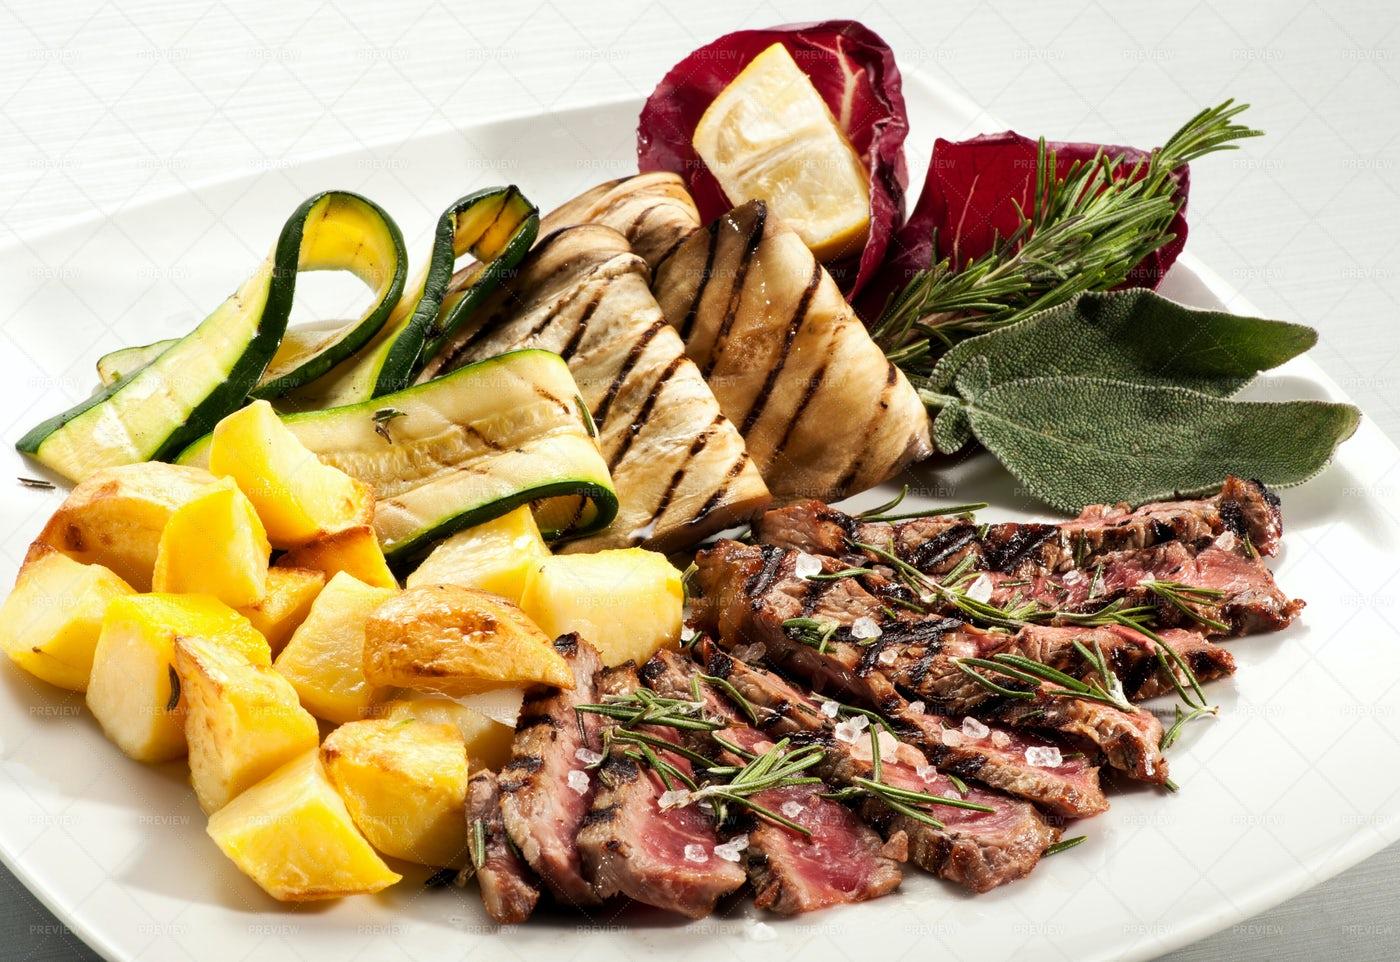 Steak Slices With Potatoes: Stock Photos